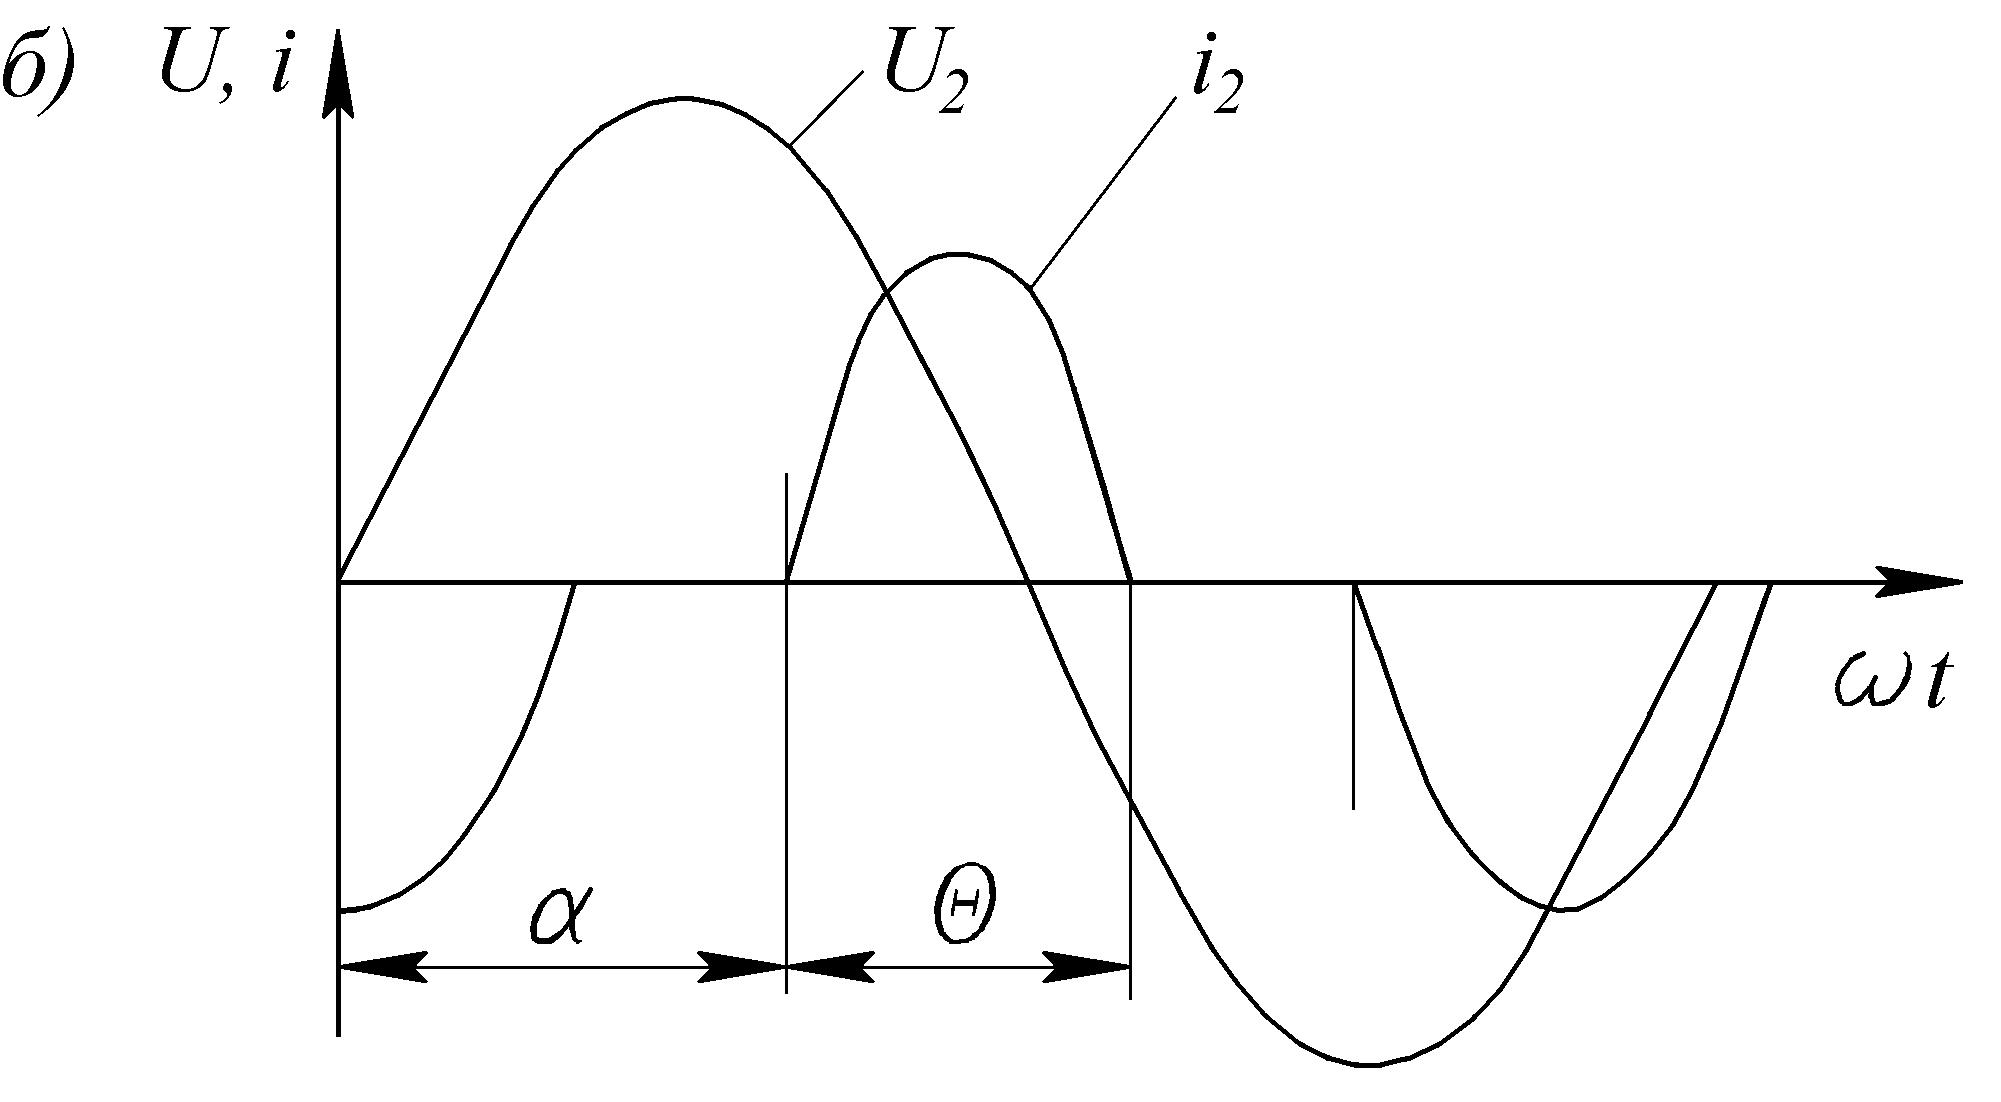 схема сварочного стабилизатора дуги